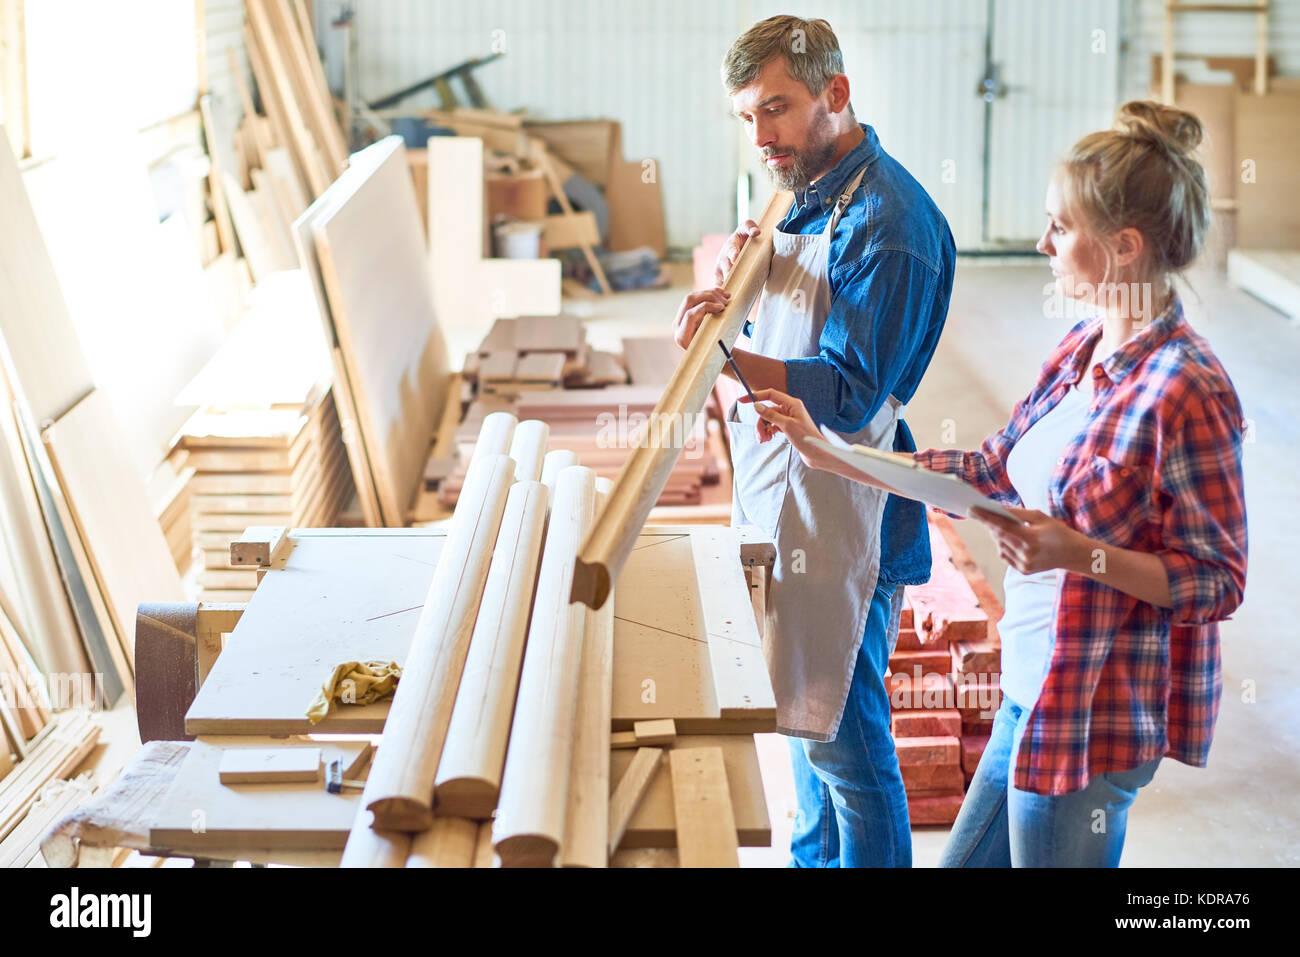 Modern Carpenters Choosing Wood - Stock Image